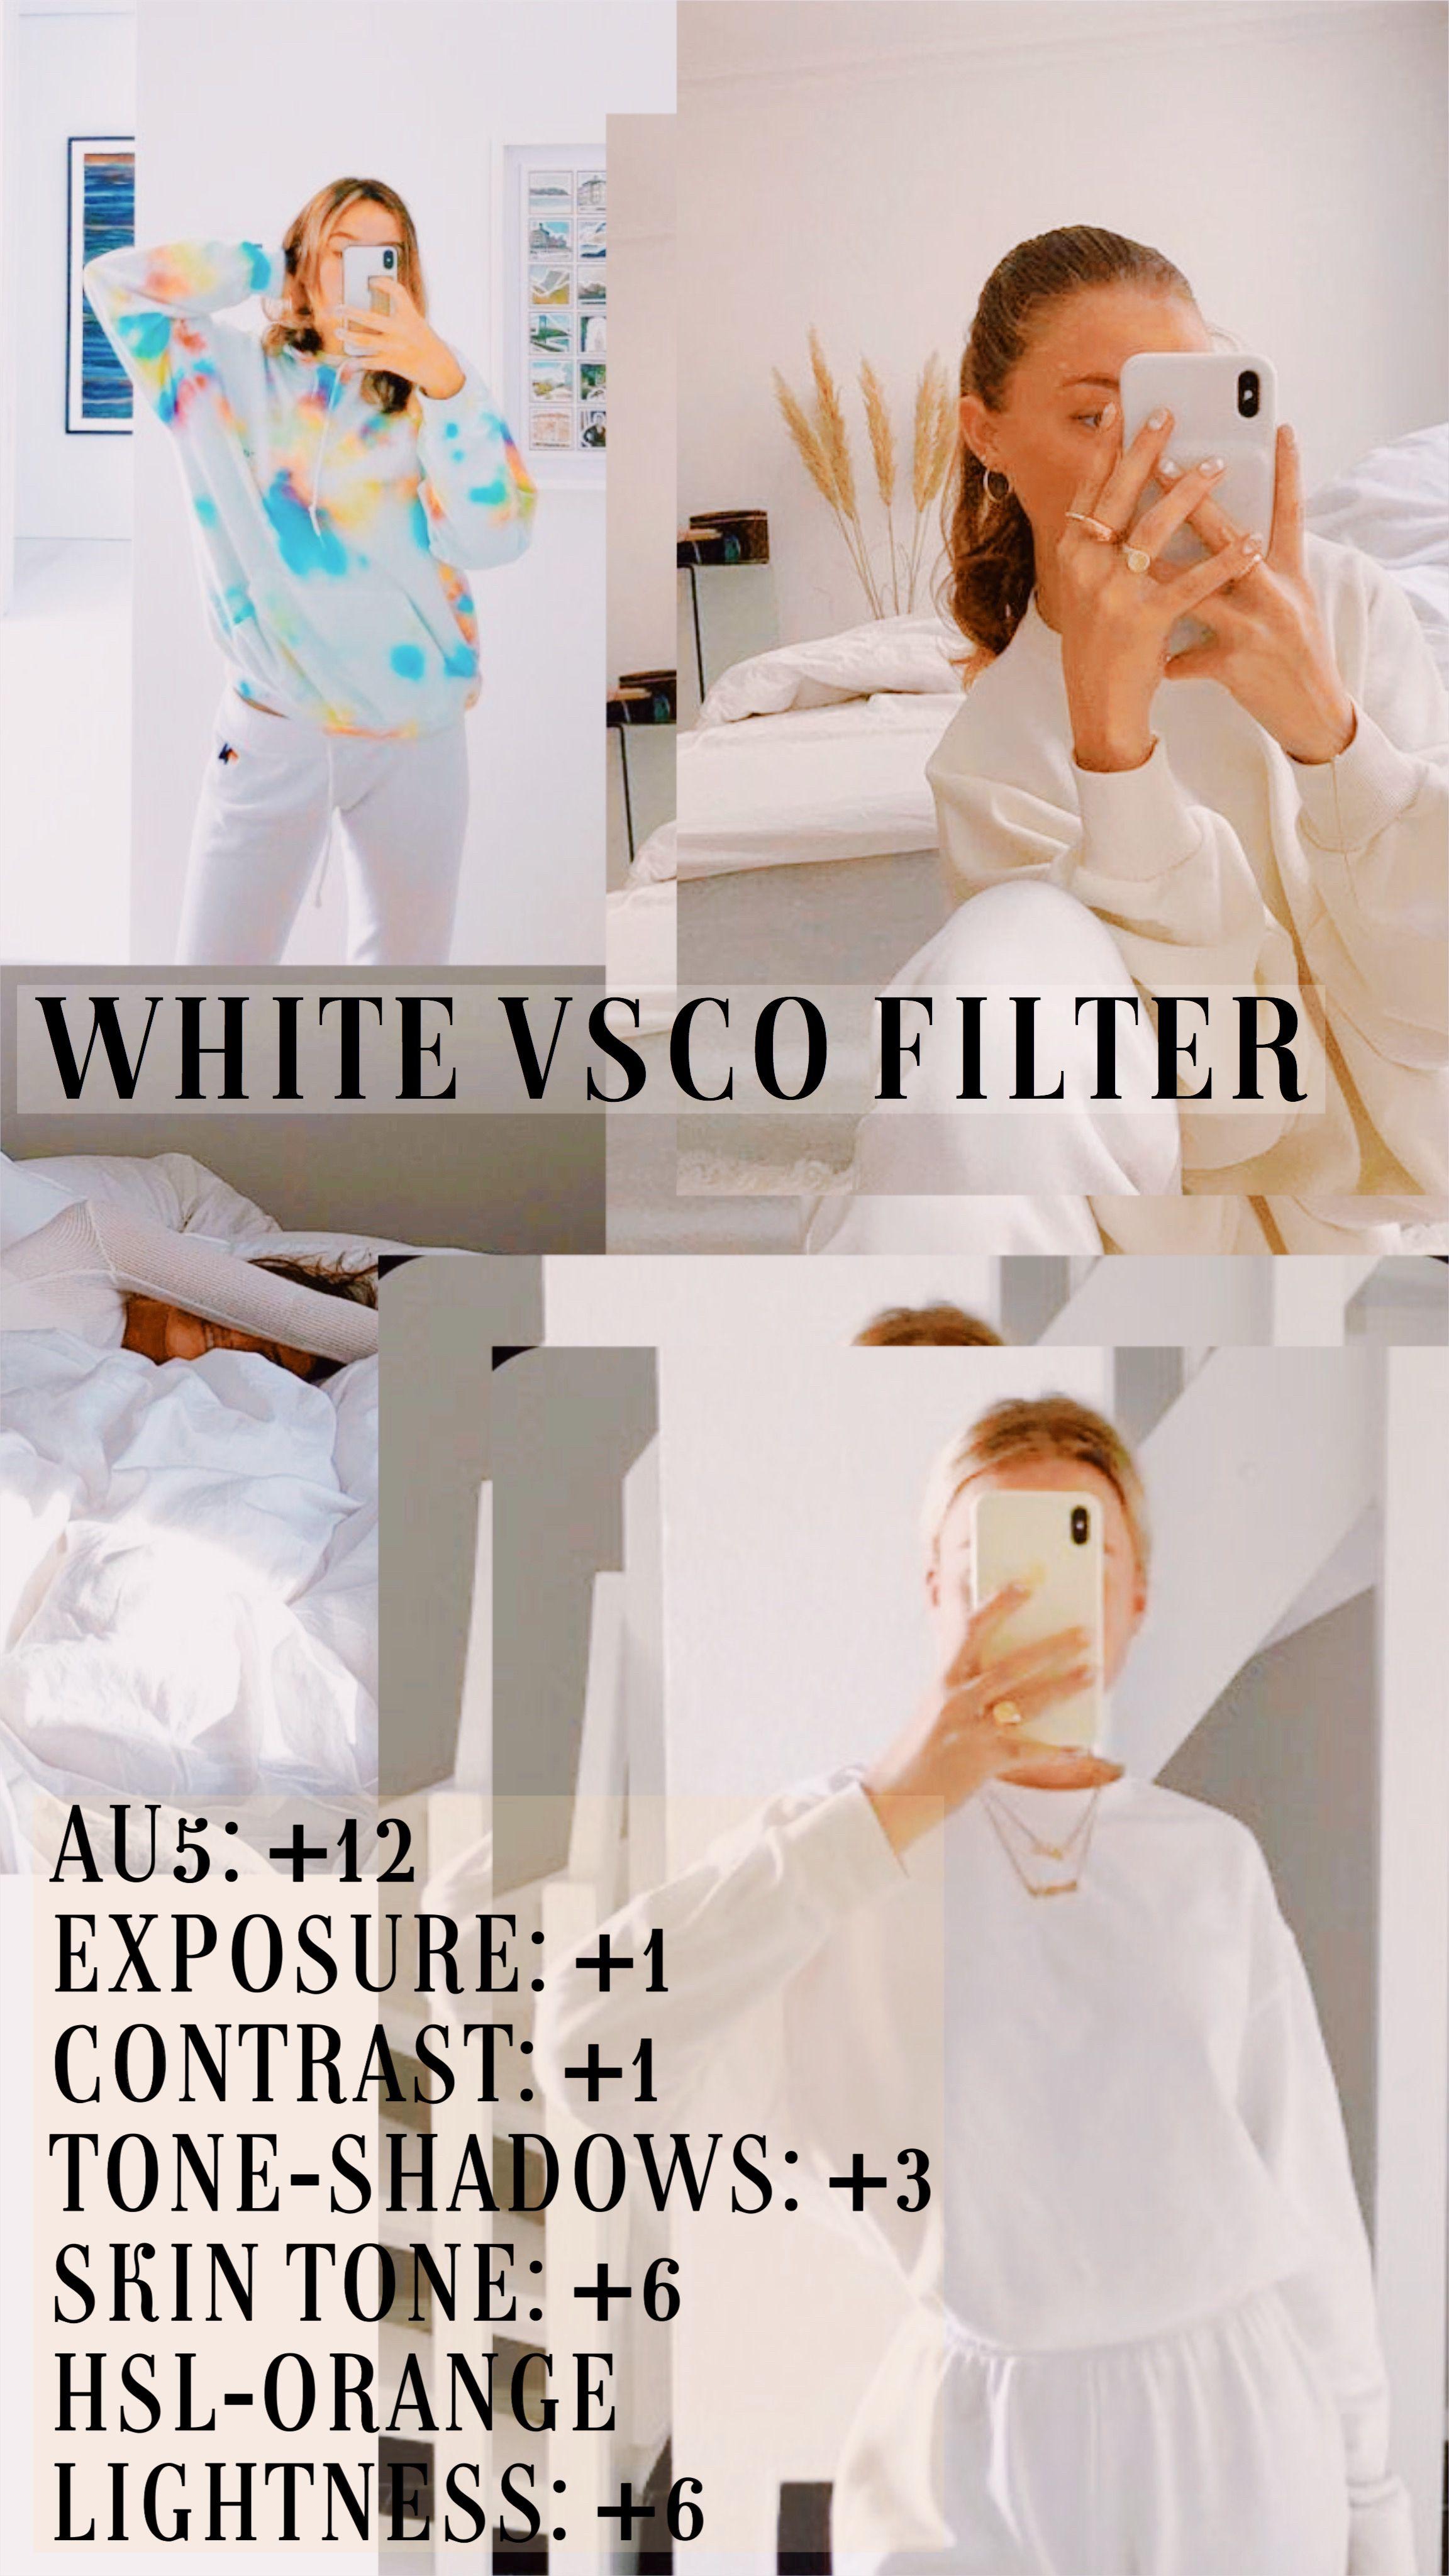 White Vsco Filter Made By Chloegriesh In 2020 Vsco Filter Vsco Filter Instagram Best Vsco Filters